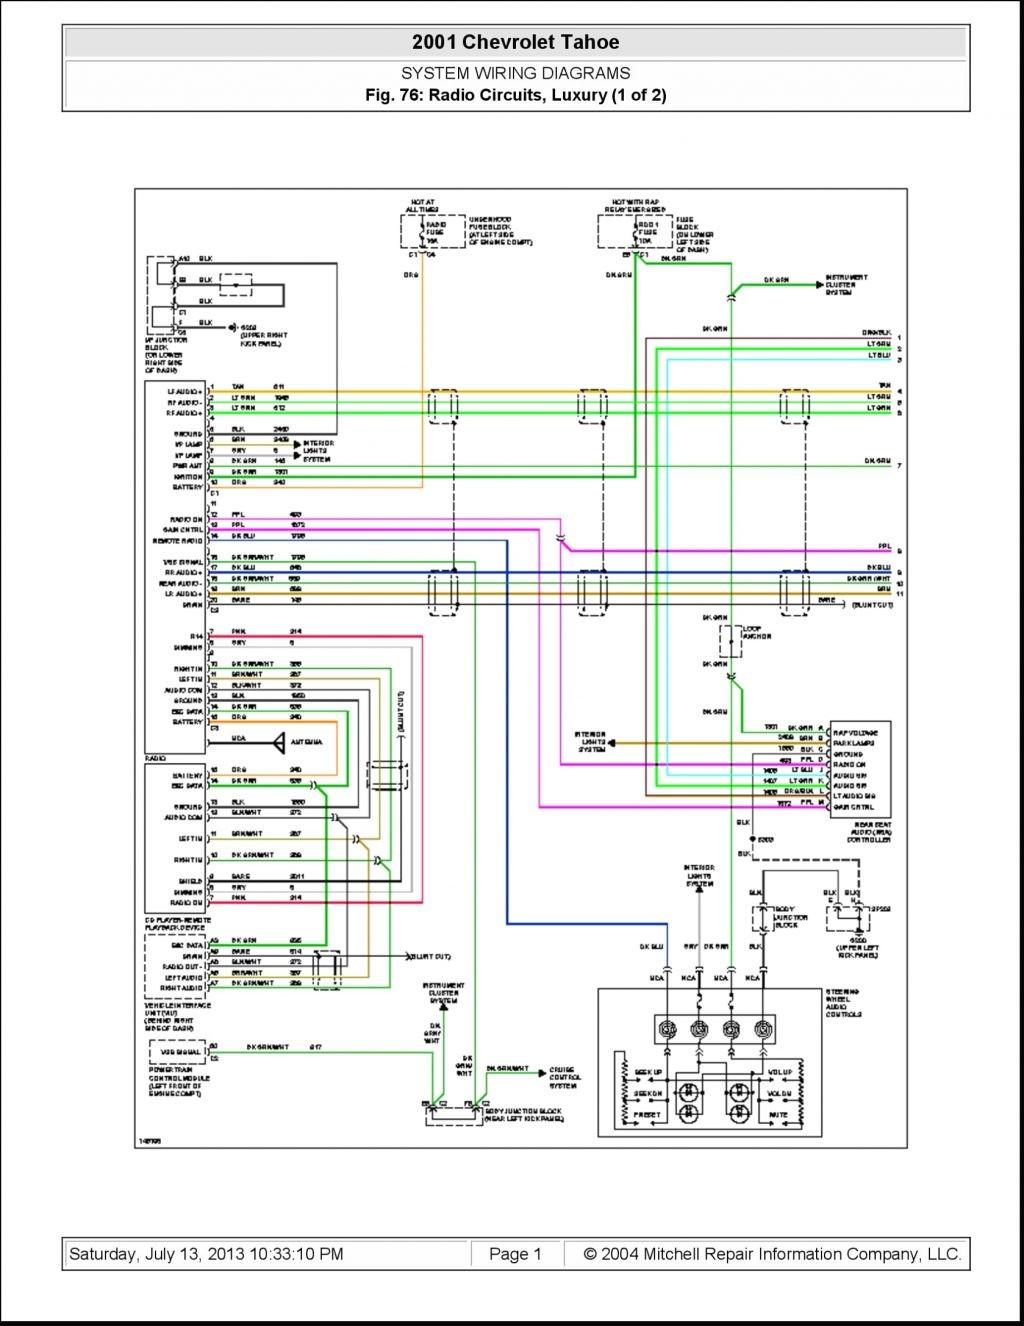 Diagram Radio Wiring For Chevy Silverado Andoyotaa a Stereo Electricalail Light